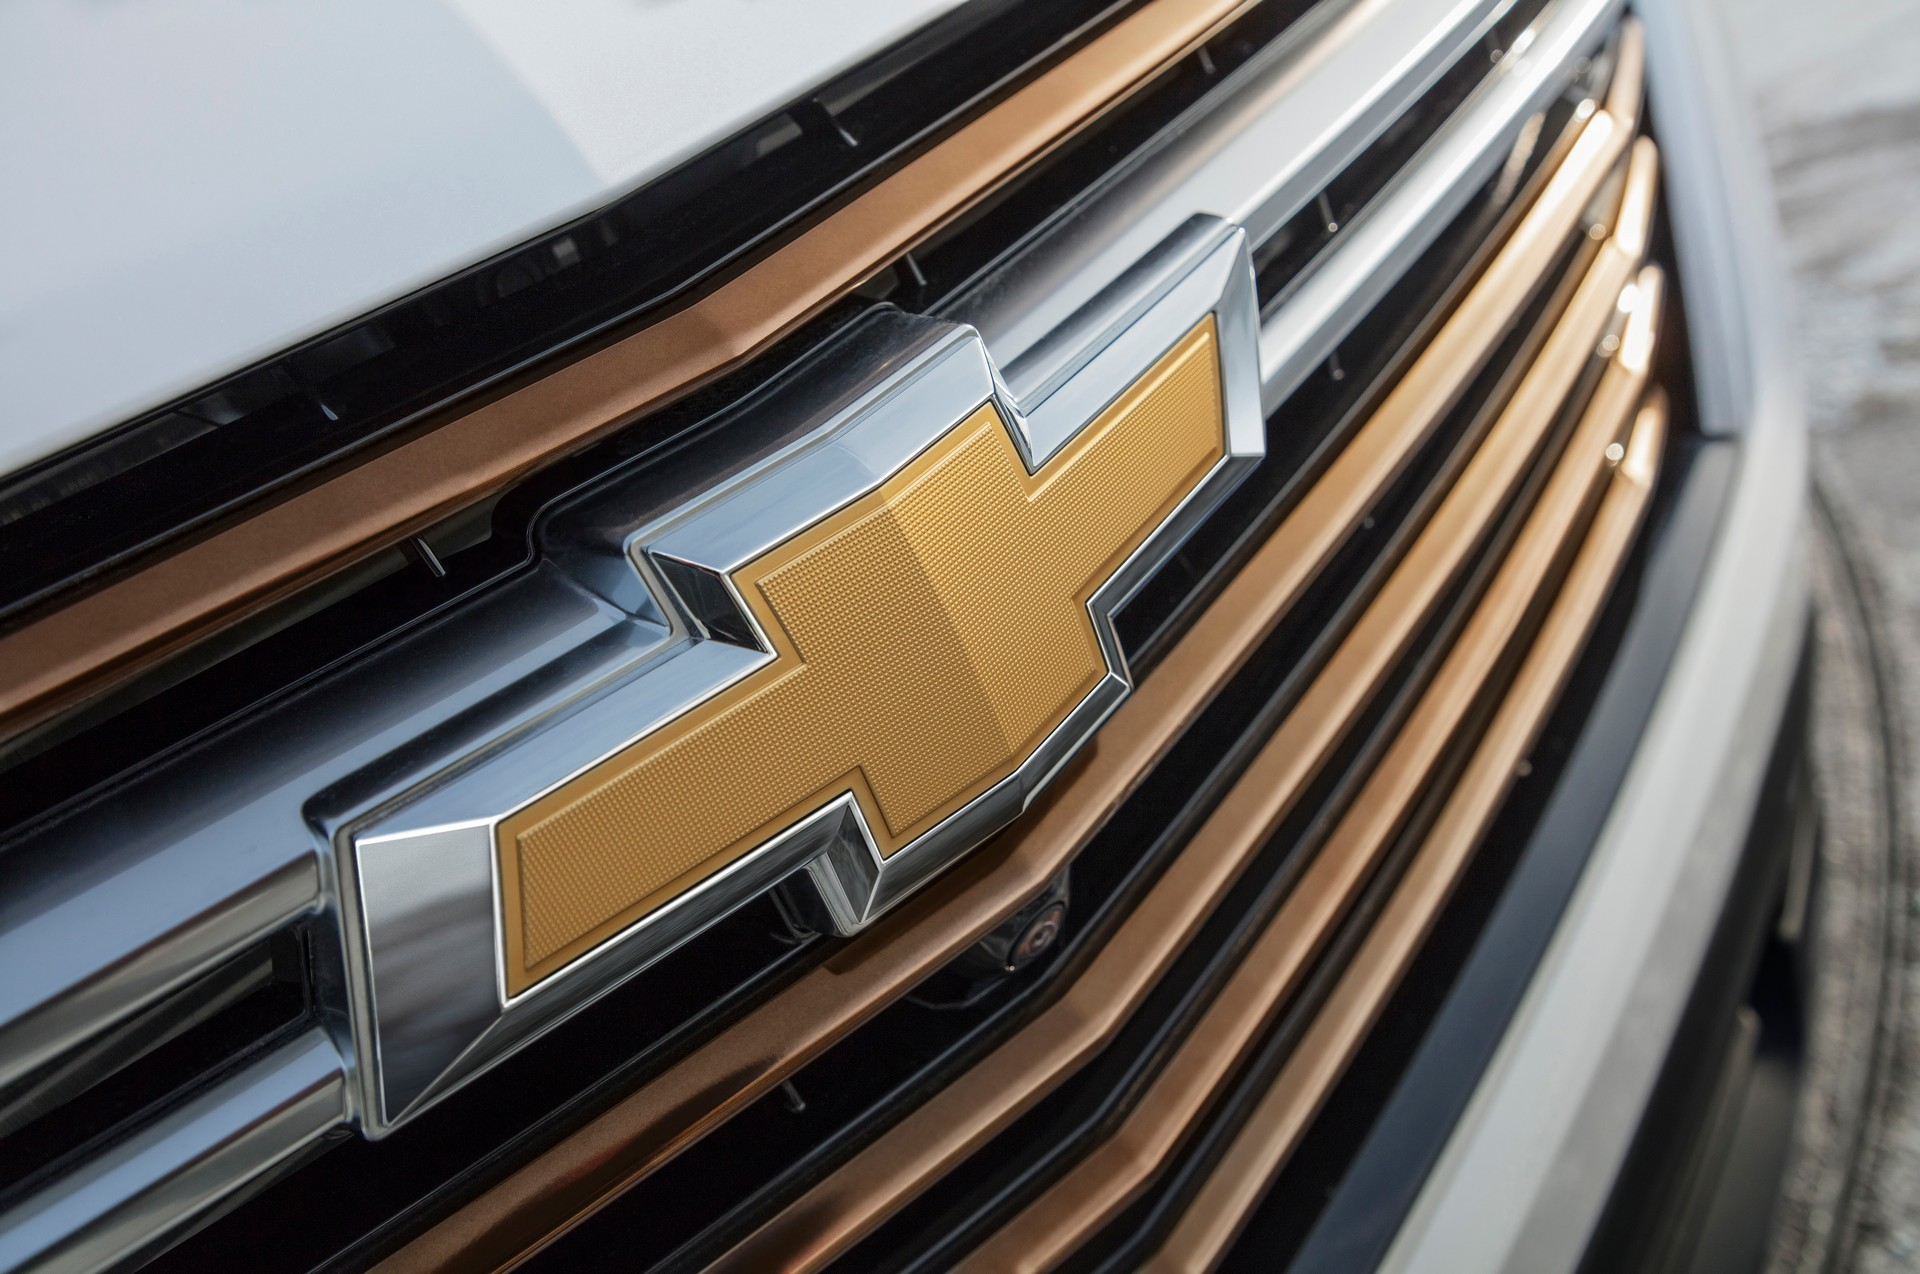 2021-Chevrolet-Traverse-4